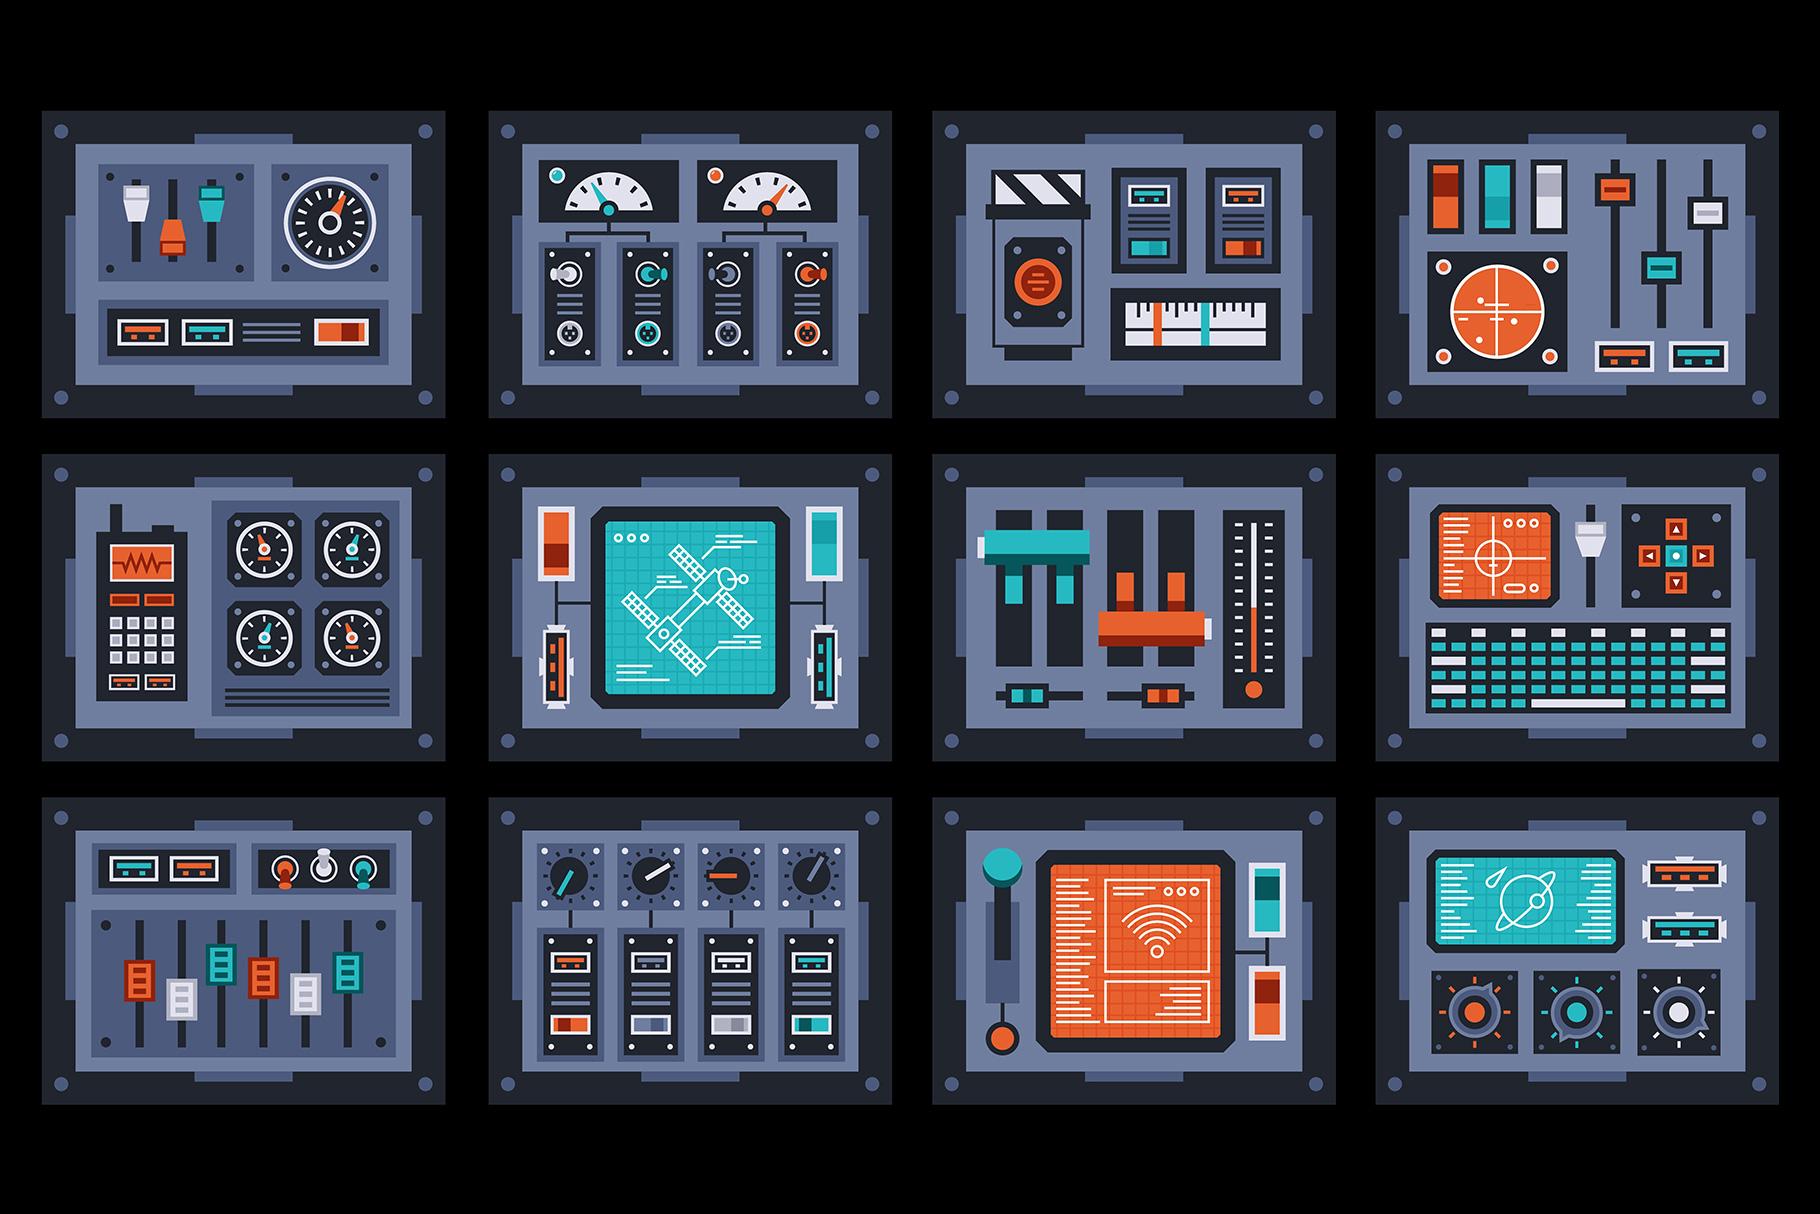 Control Panels Spaceship example image 5